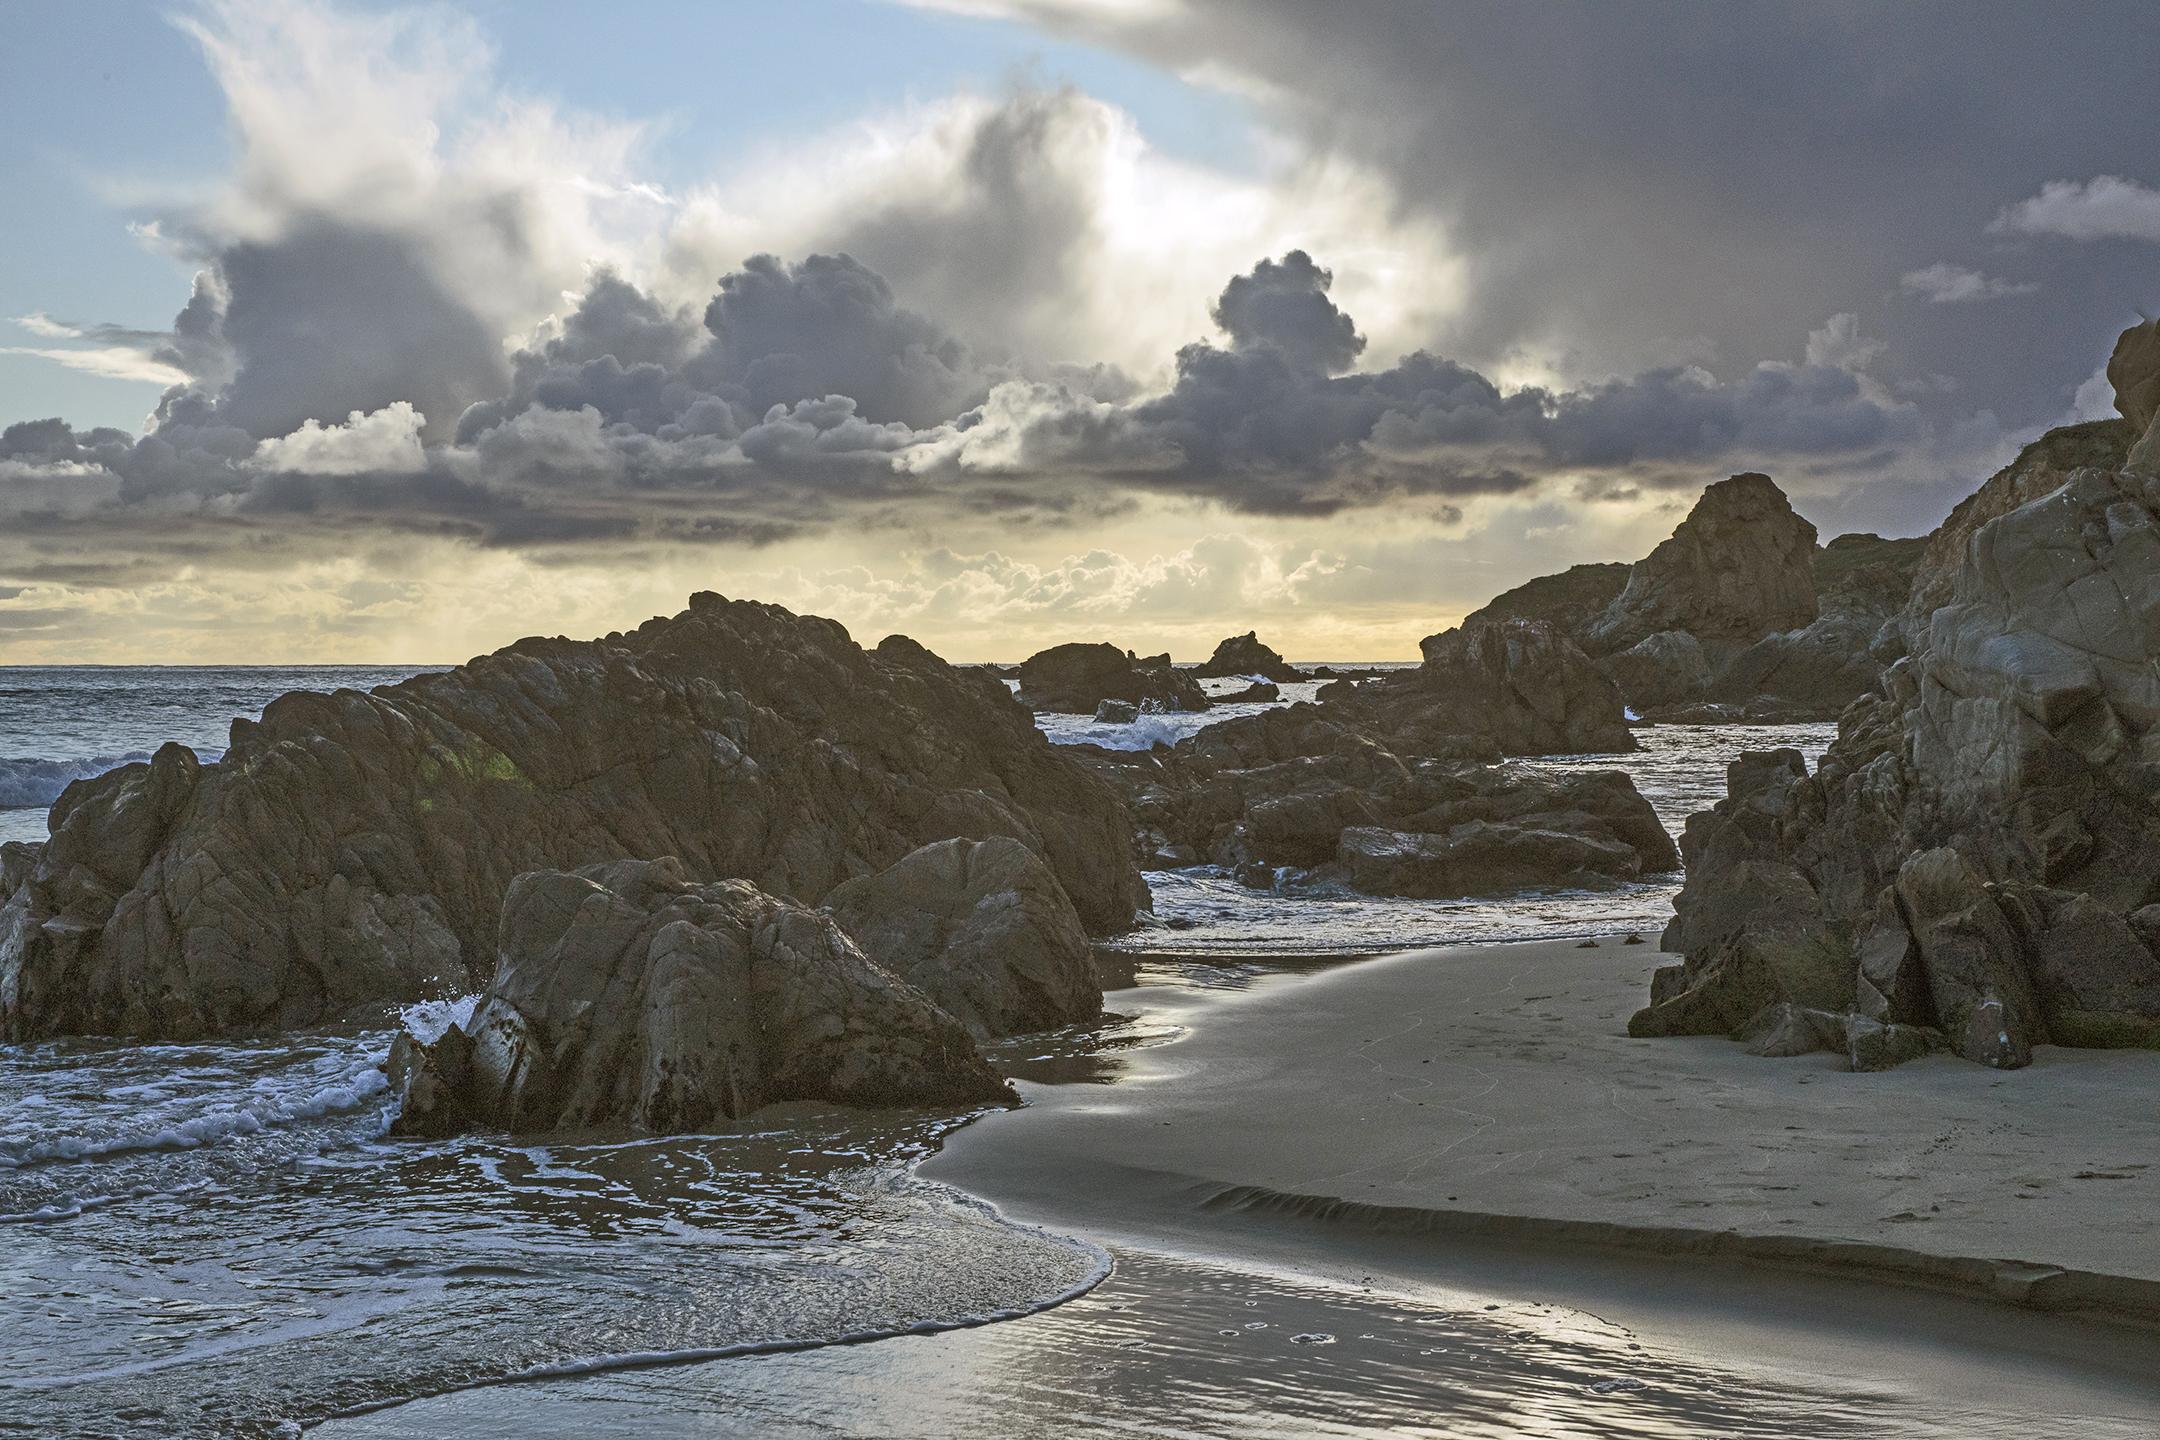 Whitehouse Creek Beach Sunset 1 - Carla Brennan